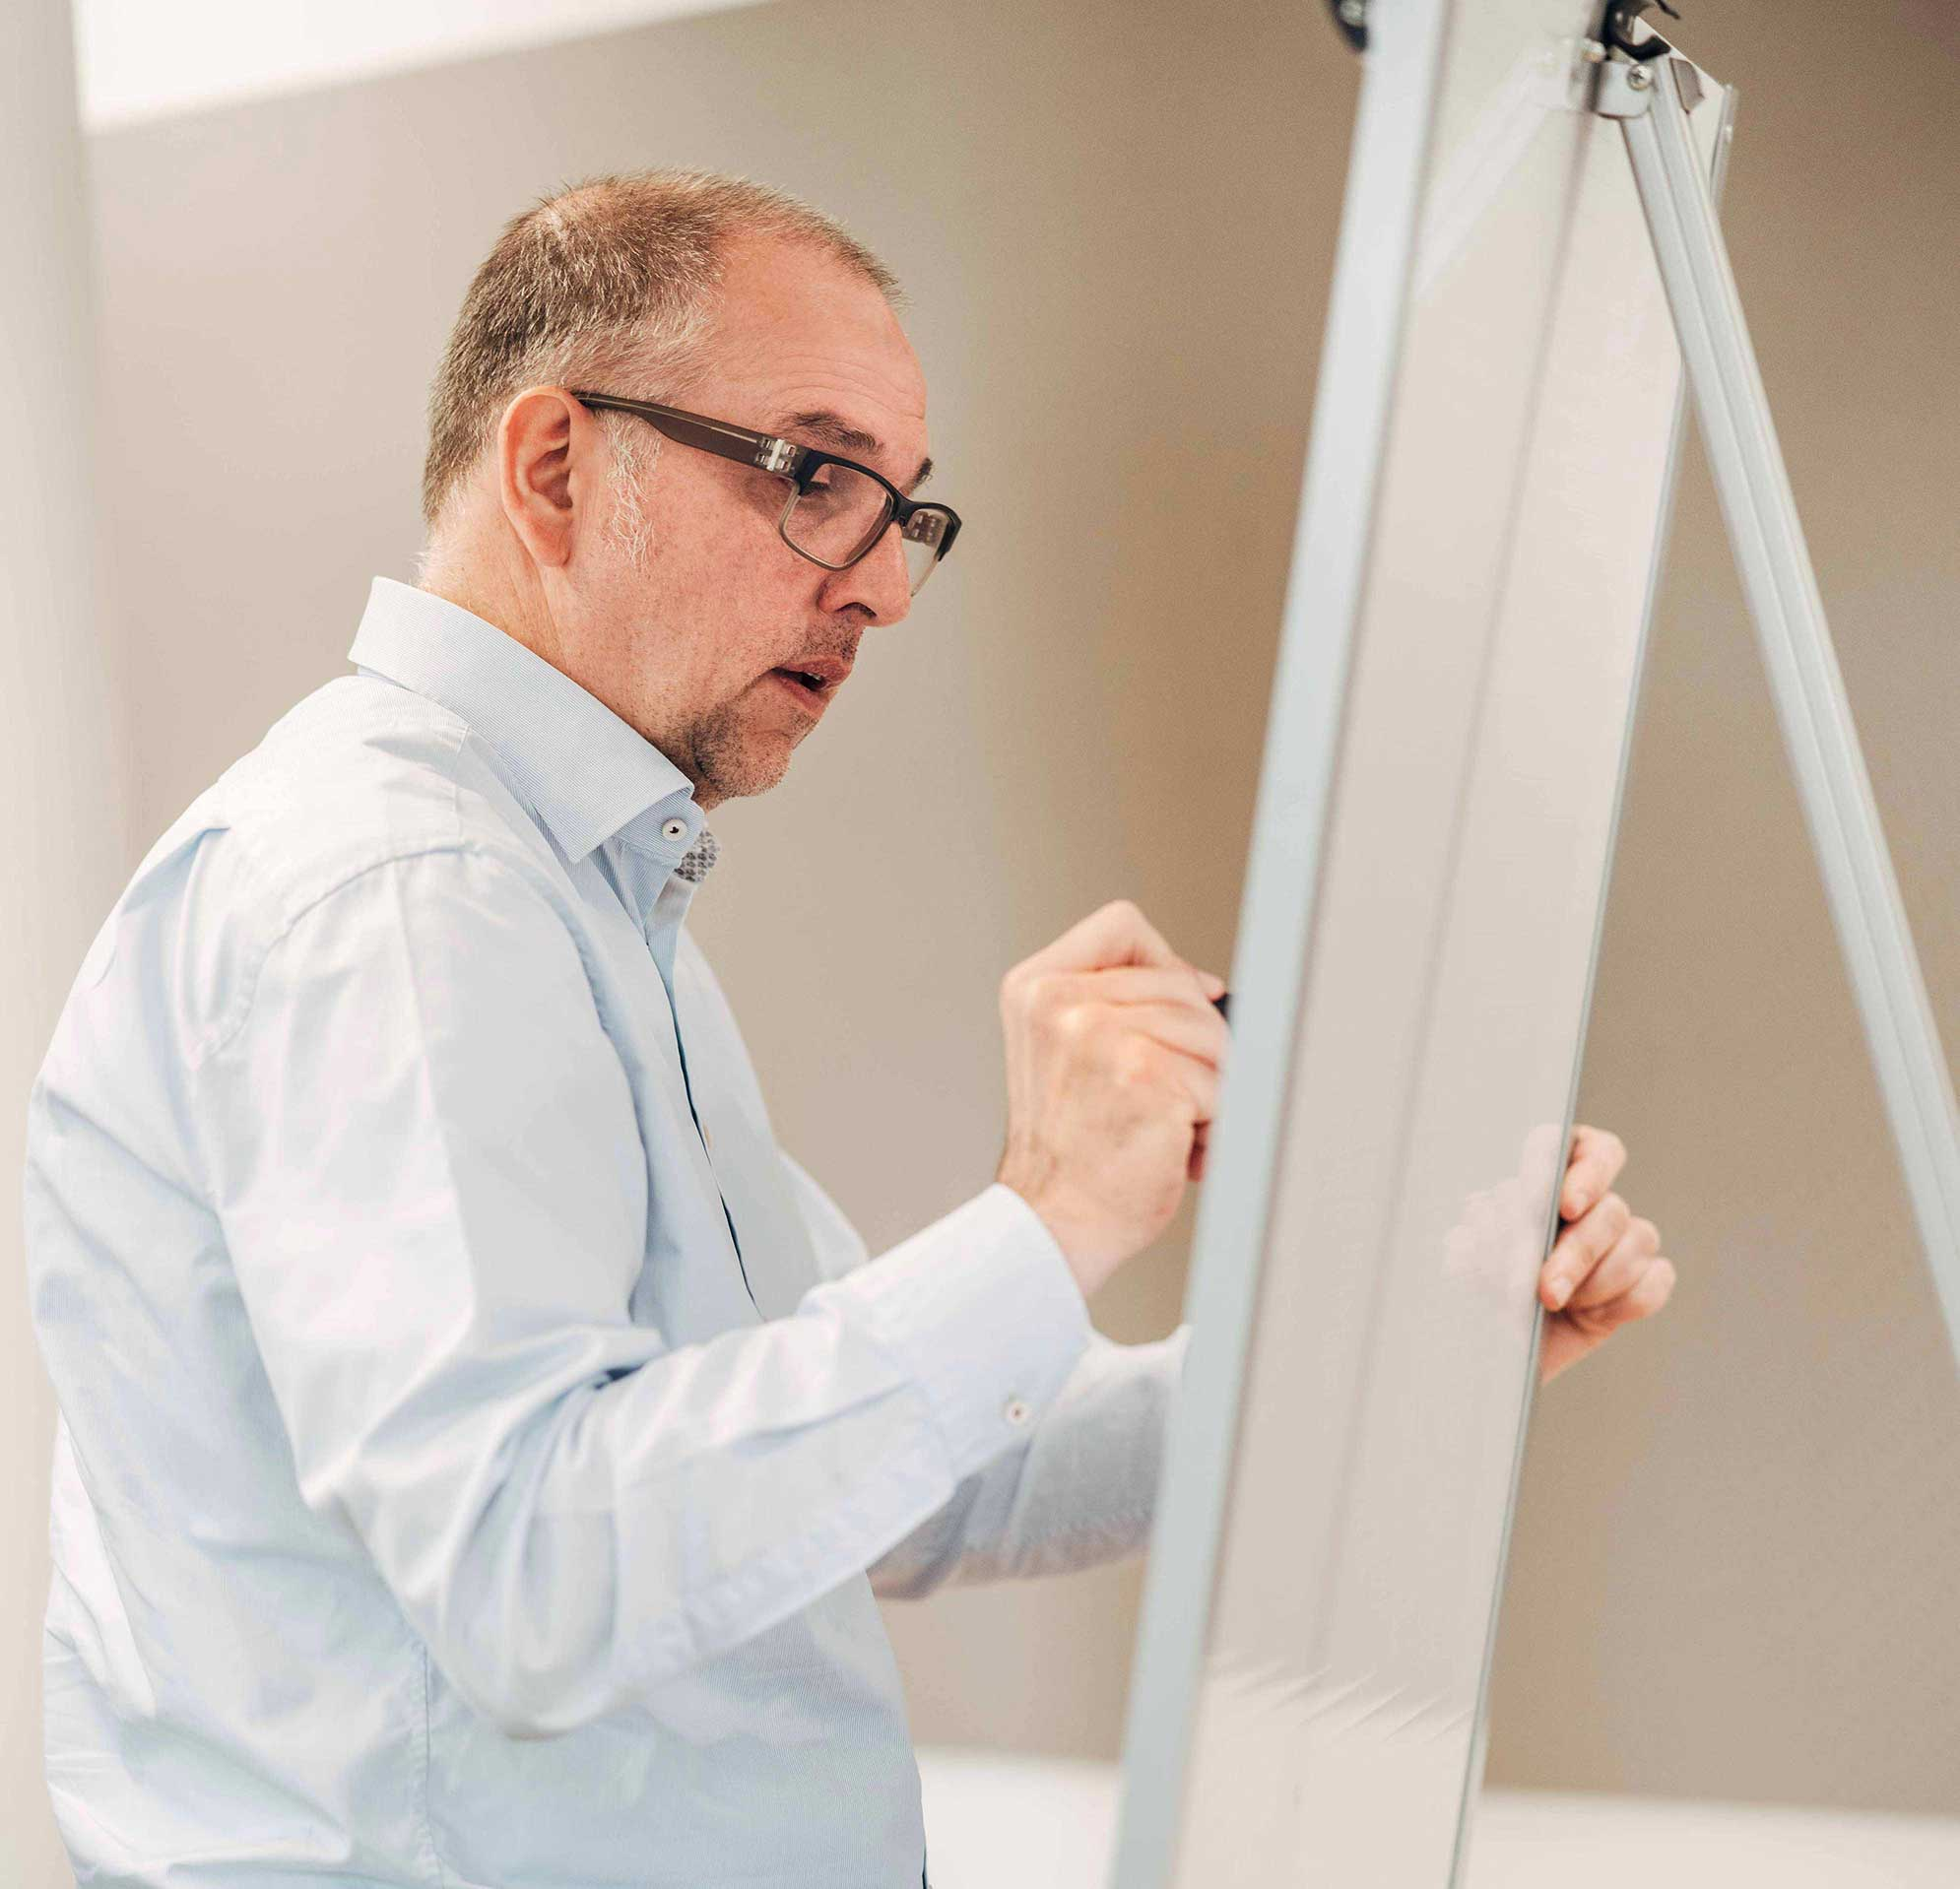 Gregor Regensberger, Senior Brand Manager Beratung bei der Markenagentur Lighthouse ®